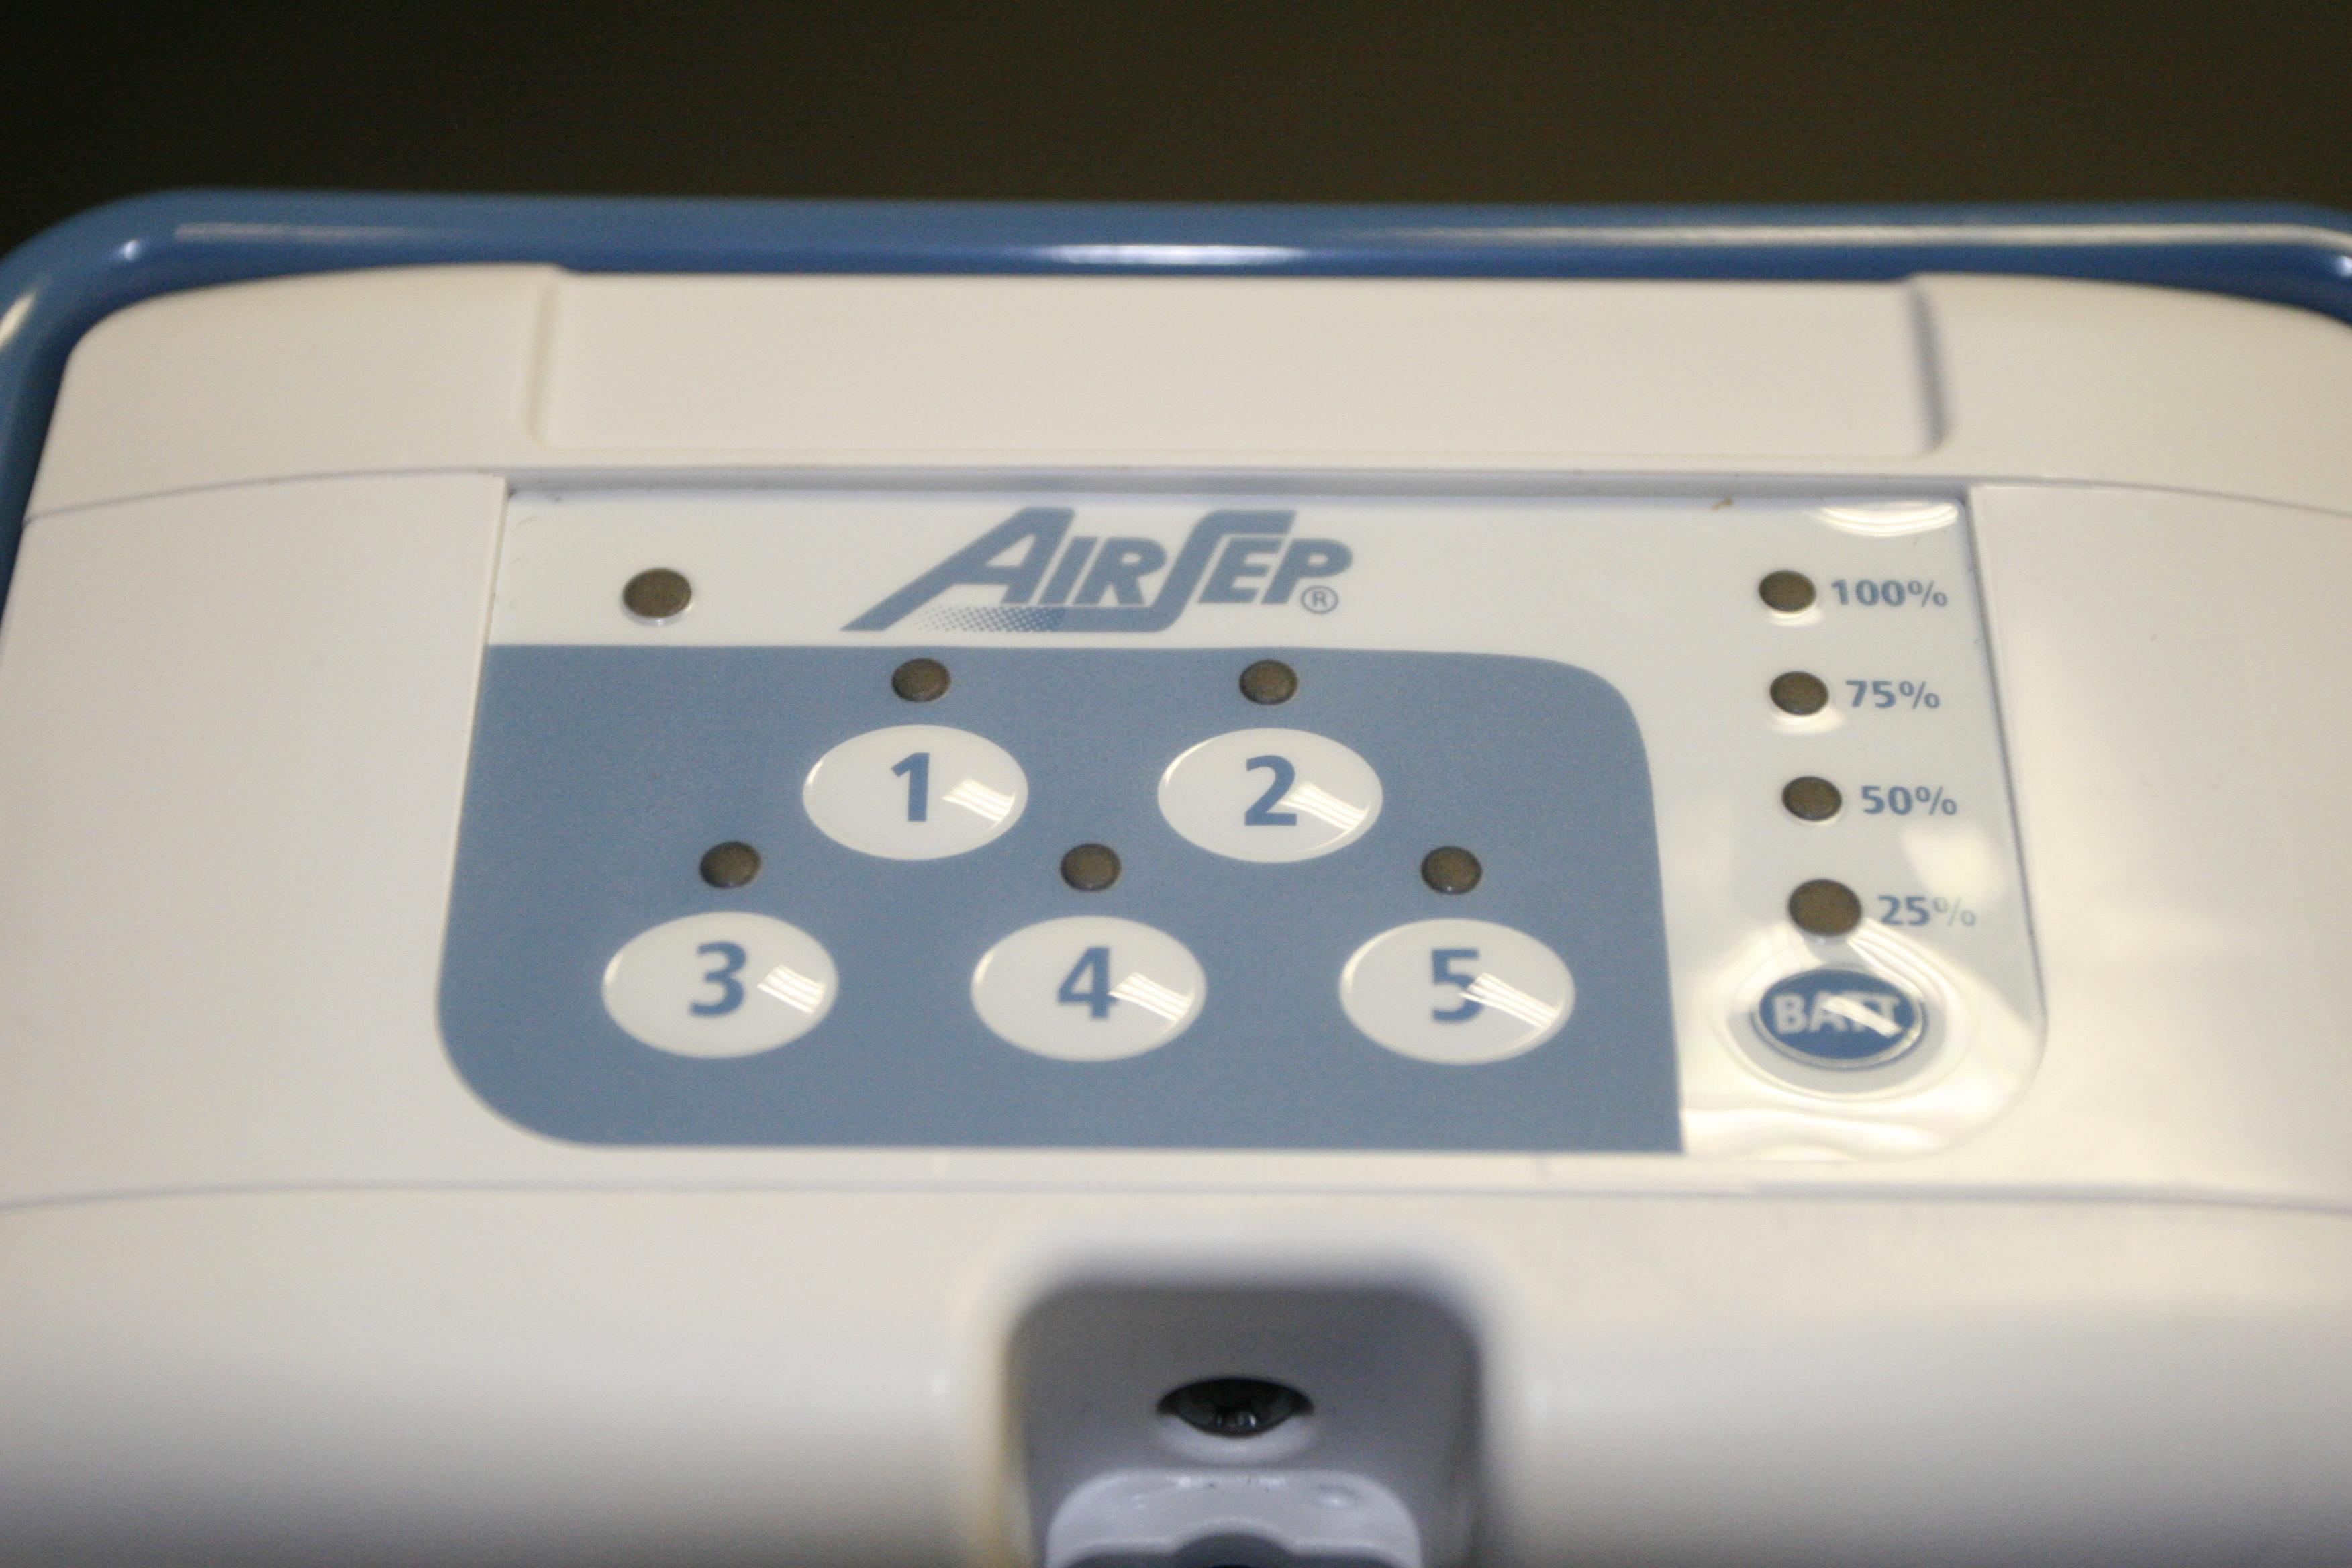 AirSep FreeStyle 5 Control Panel